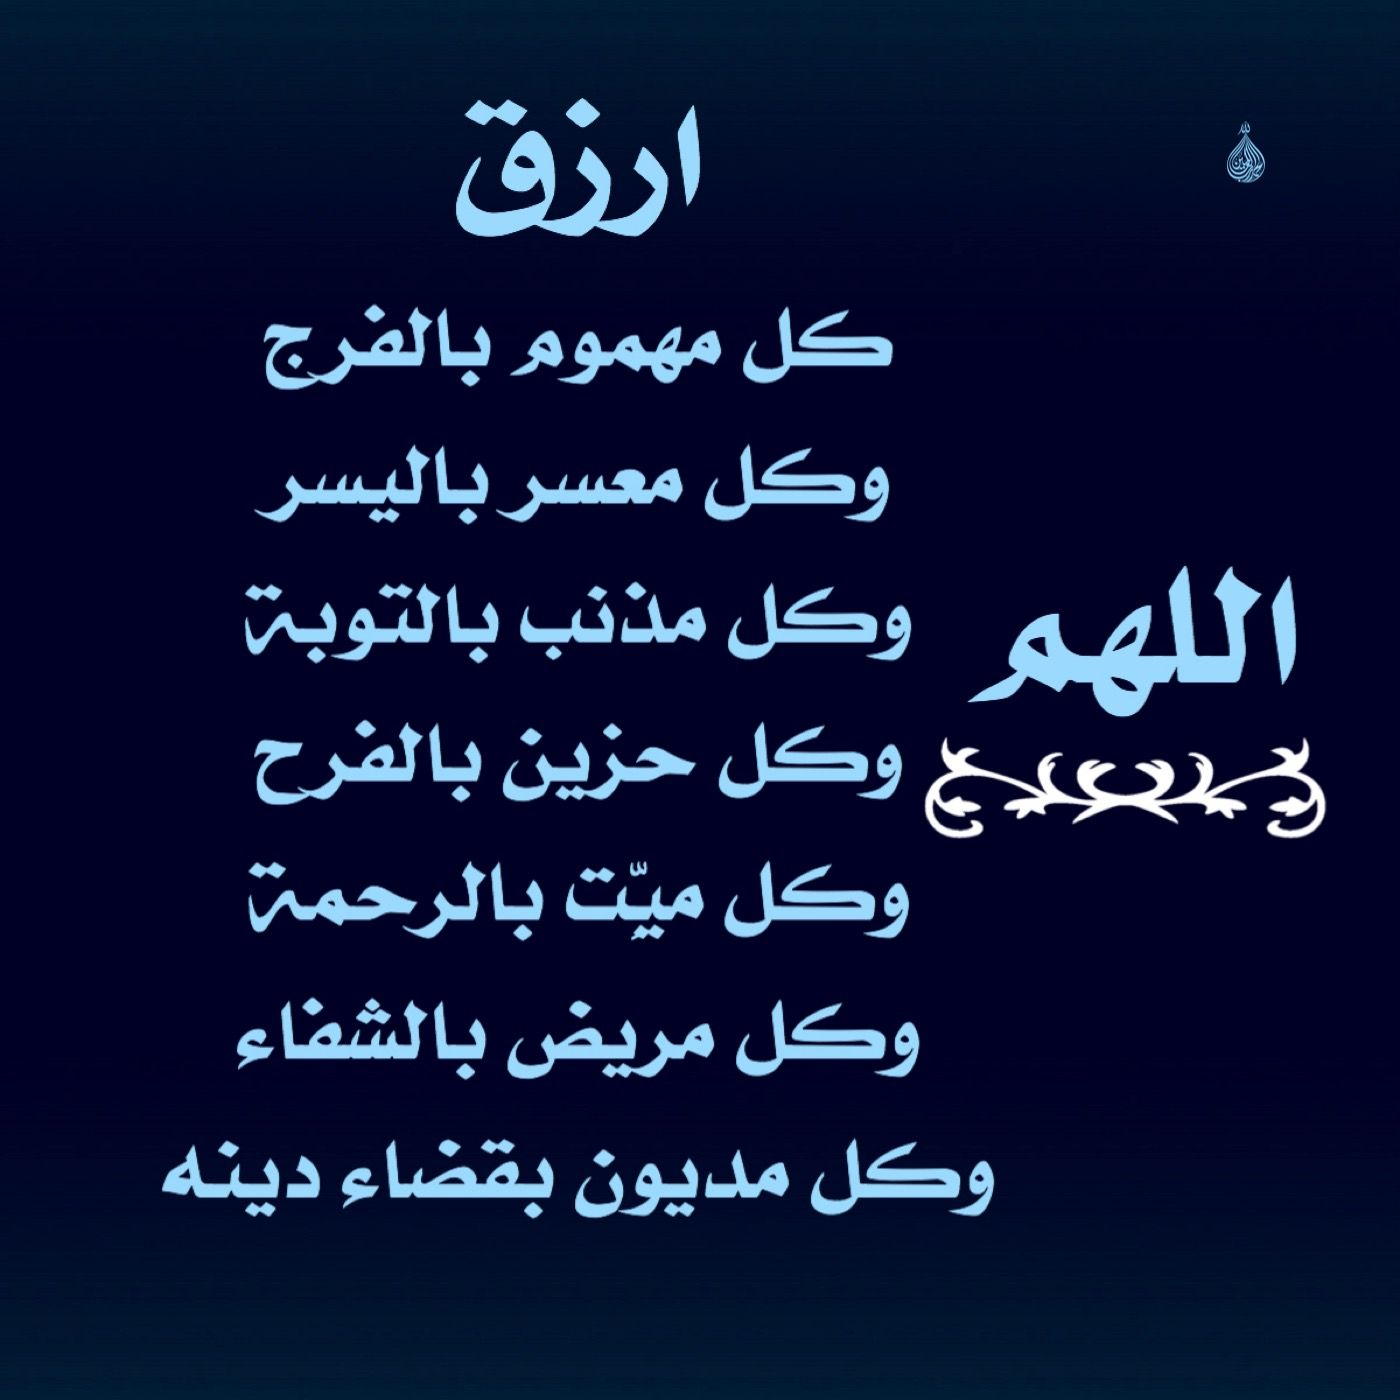 Pin By أدعية إسلامية دعاء أأذكار الج On معلومات والإسلامية True Quotes Quotes Islam